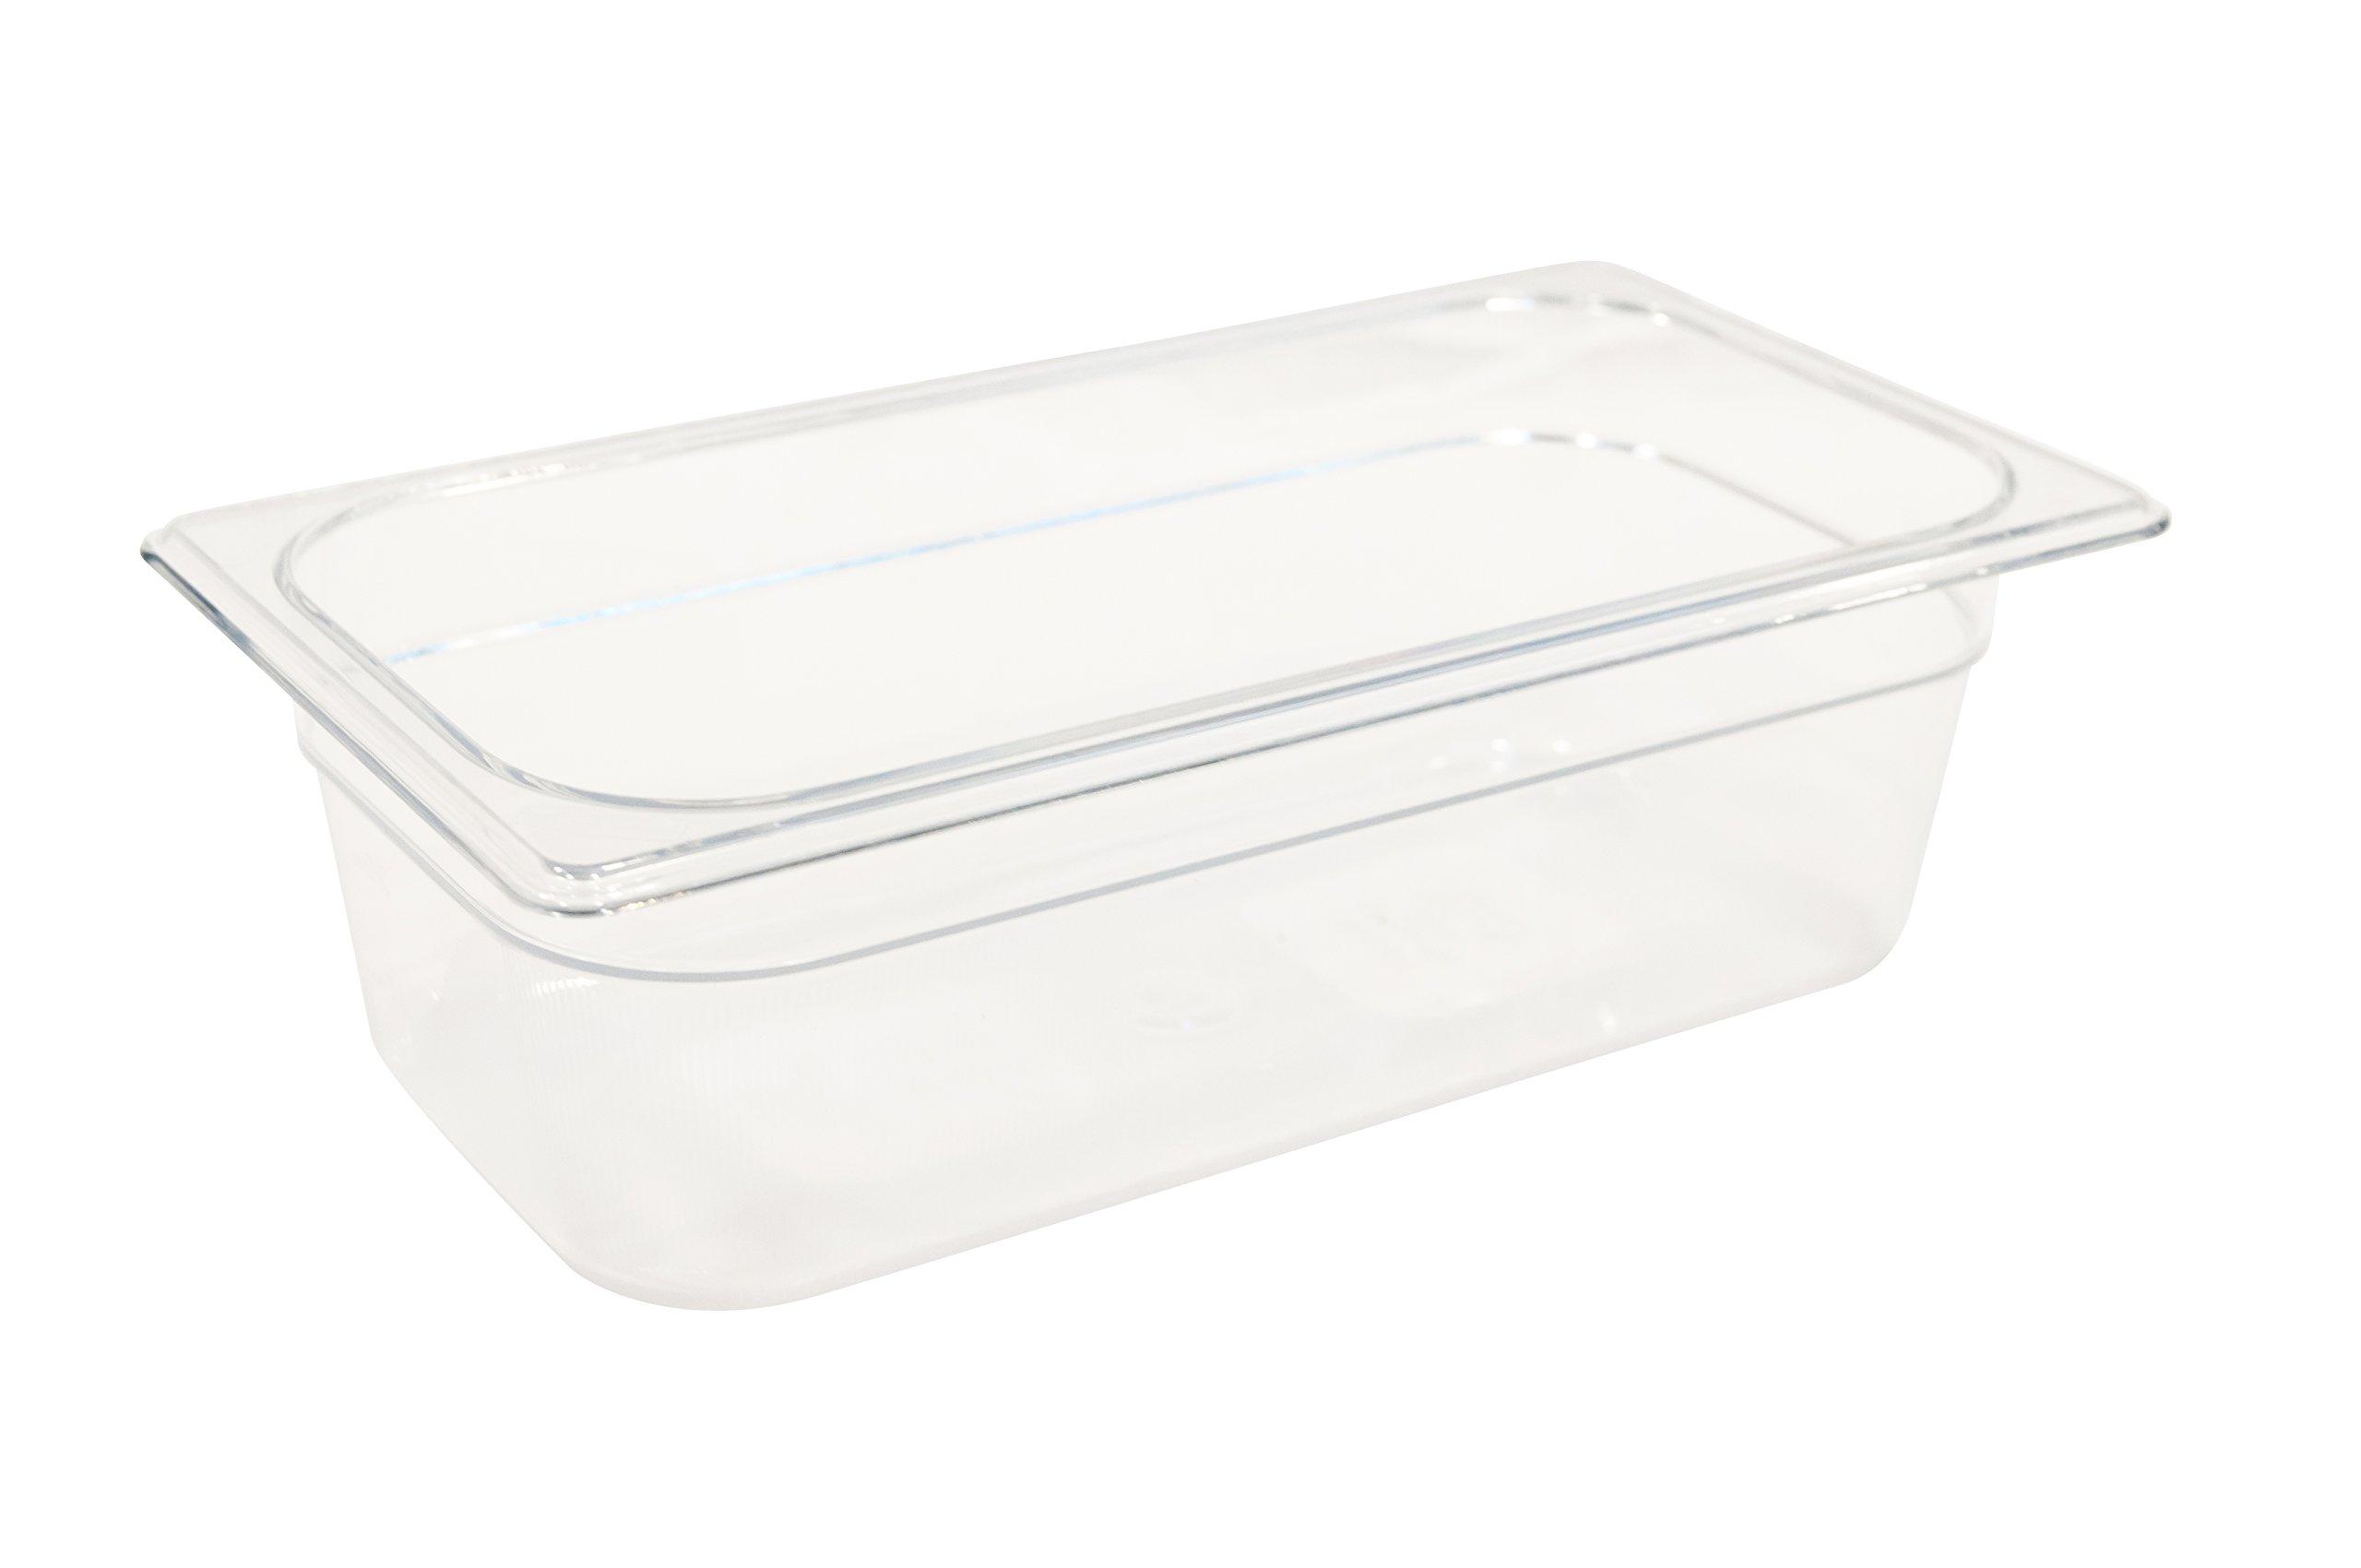 Rubbermaid Commercial Products FG117P00CLR 1/3 Size 4-Quart Cold Food Pan